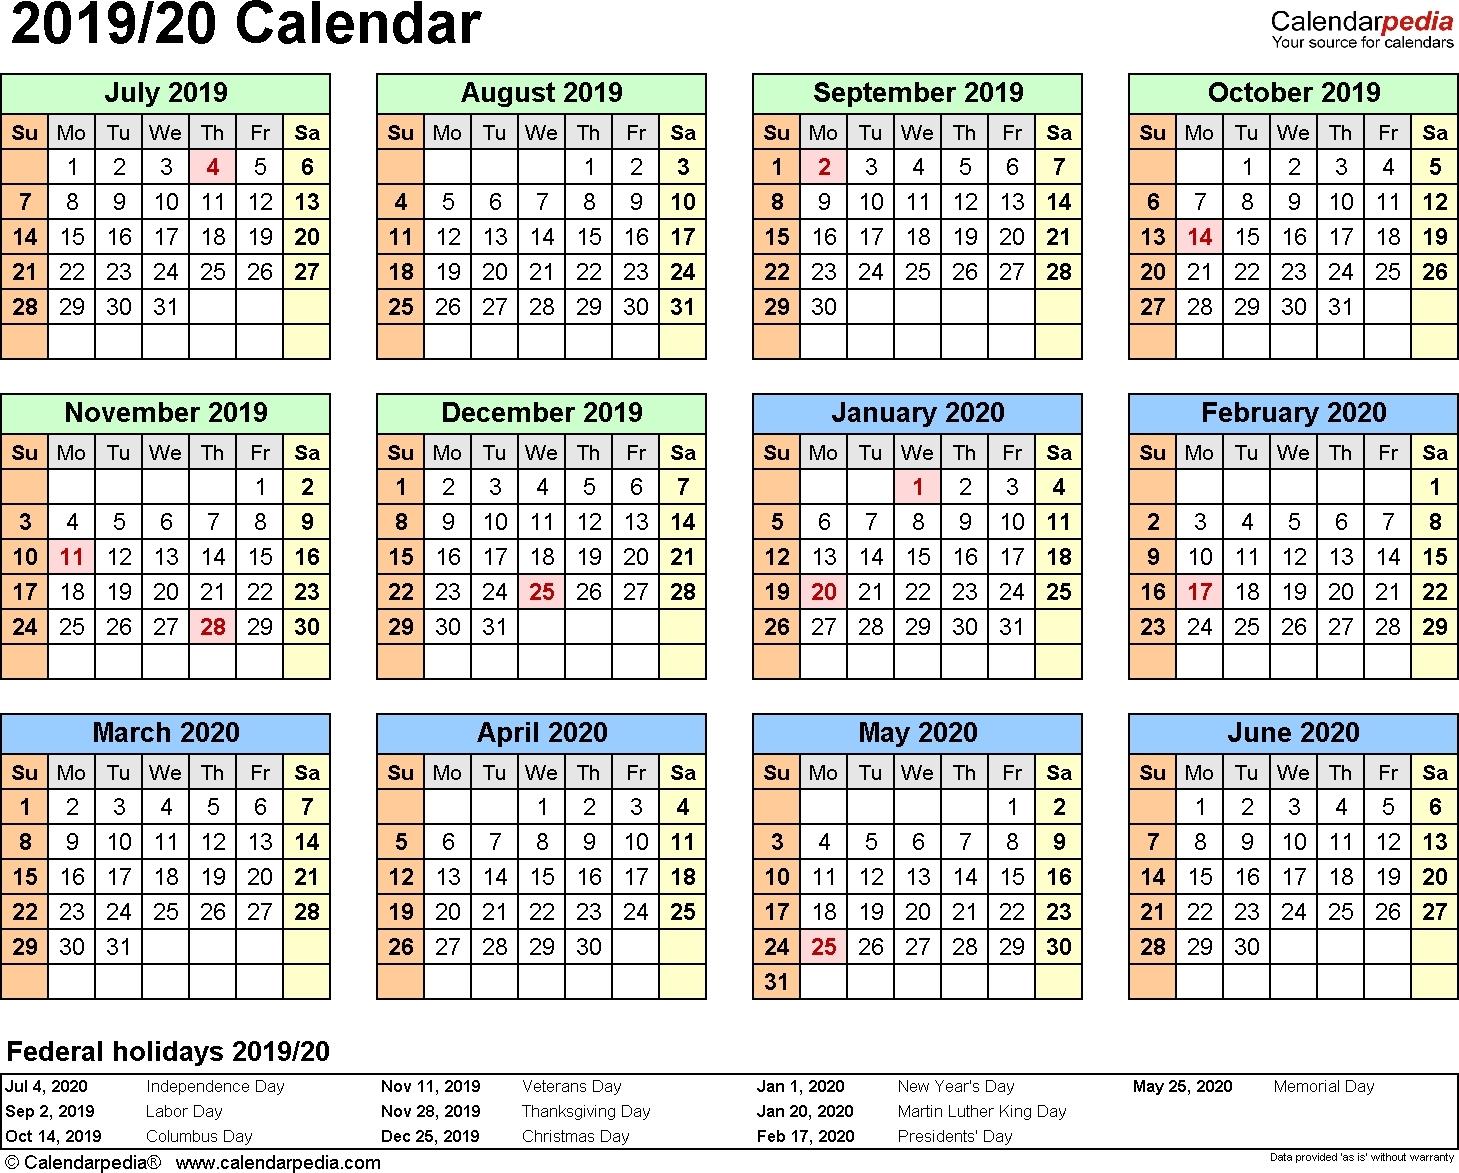 Upanayan Dates In 2020-2021 - Google Search-Gujarati Calendar 2020 January To December